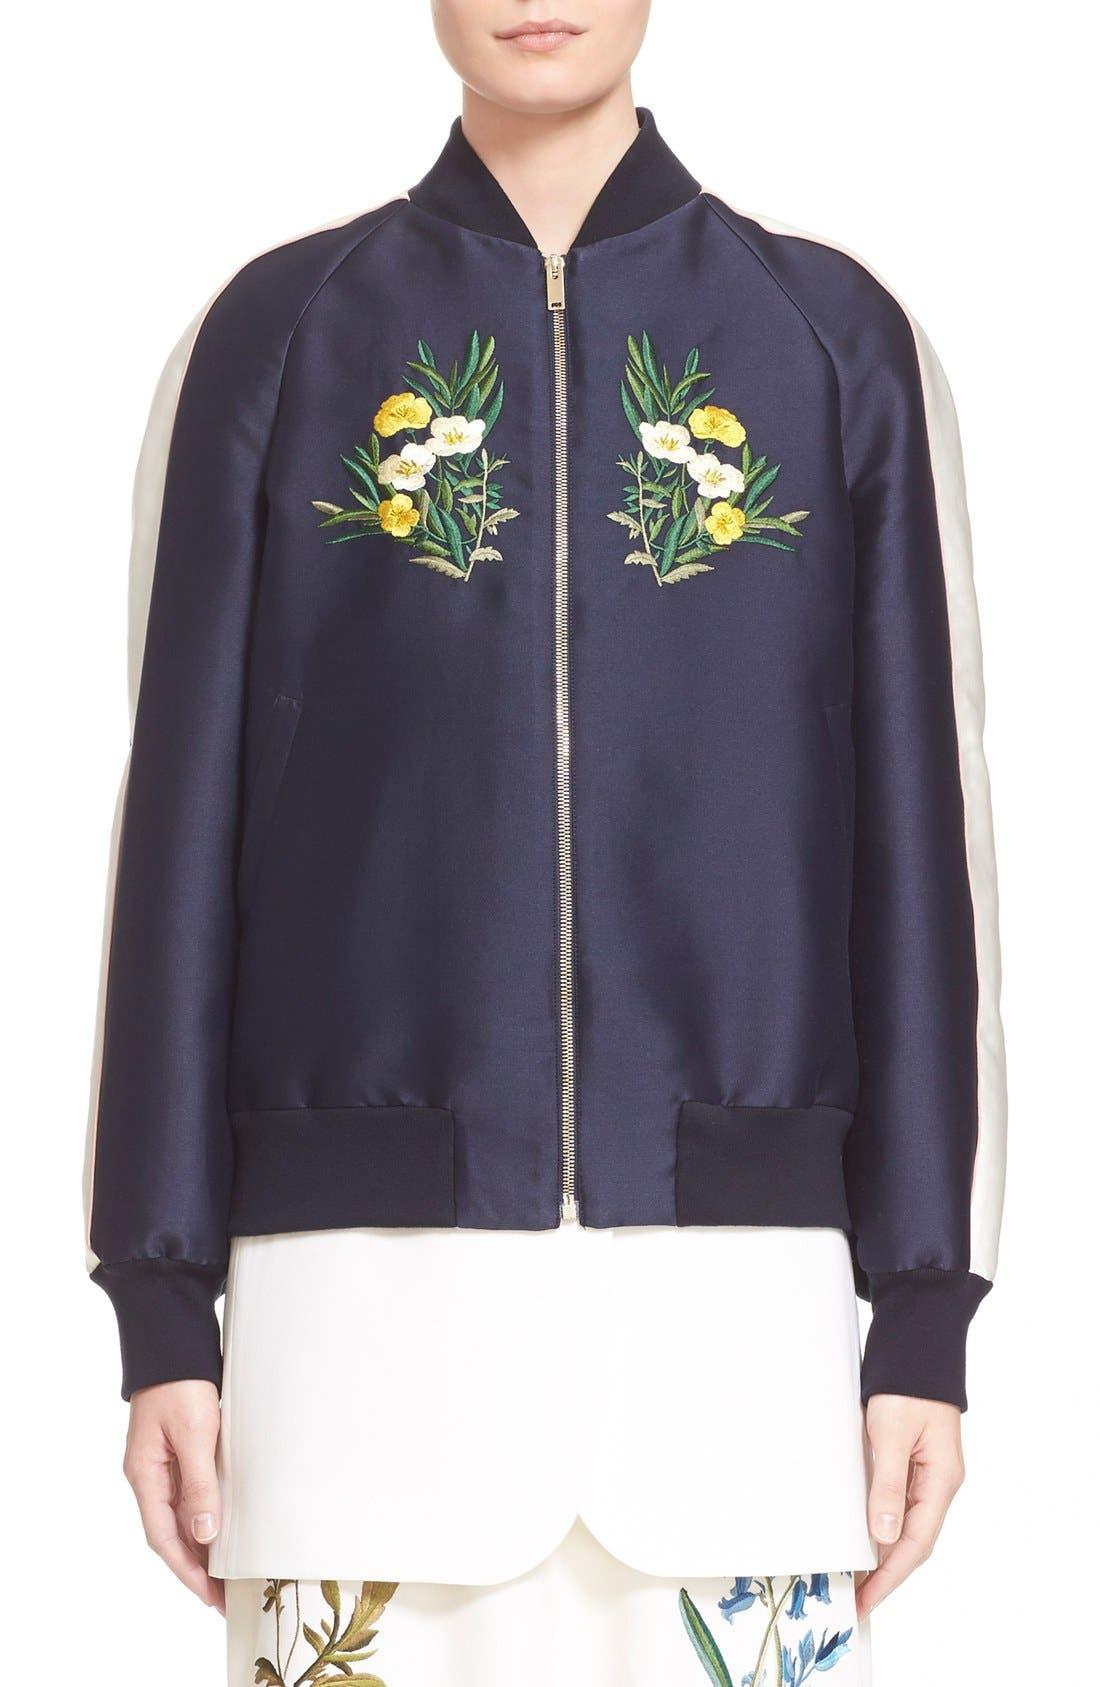 'Lorinda' Floral Embroidered Bomber Jacket,                             Main thumbnail 1, color,                             009